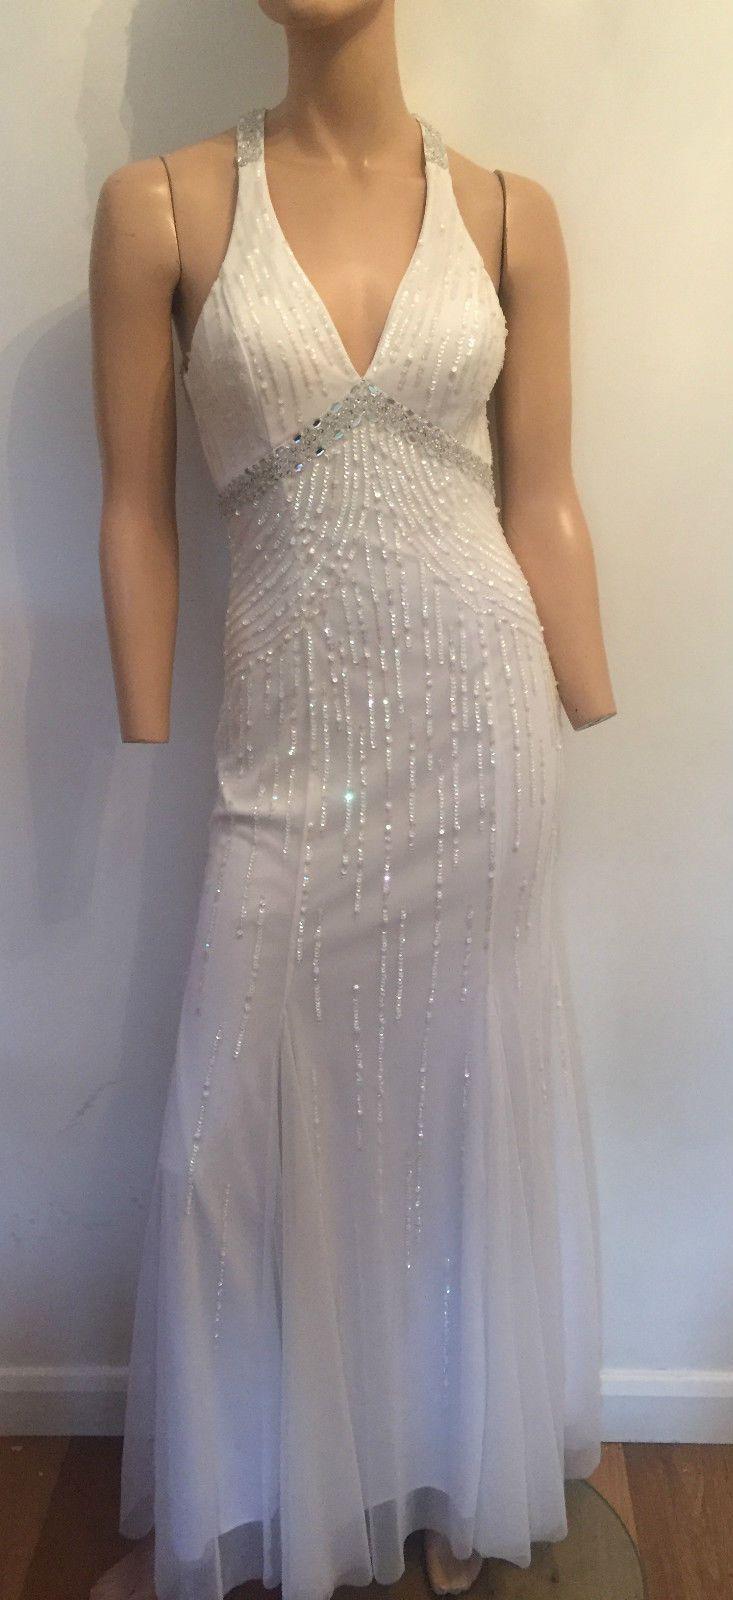 Belonged to katie price designer davids bridal wedding